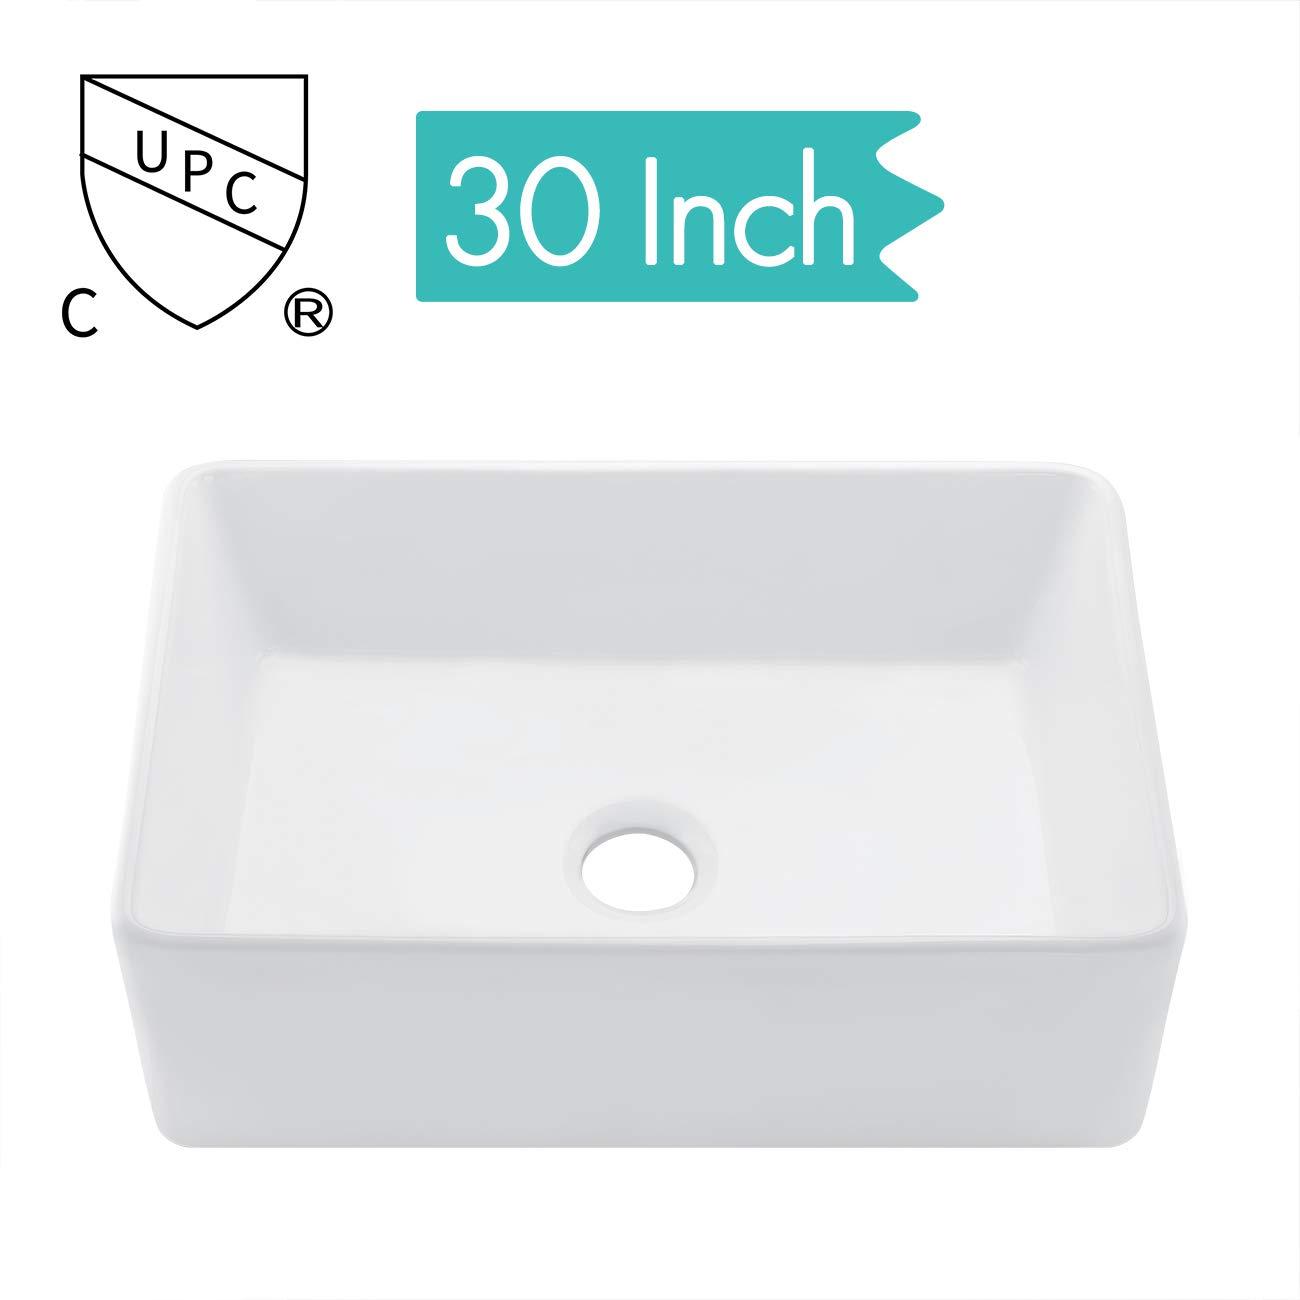 KES cUPC Fireclay Sink Farmhouse Kitchen Sink (30 Inch Porcelain Undermount Rectangular White) BVS117 by KES